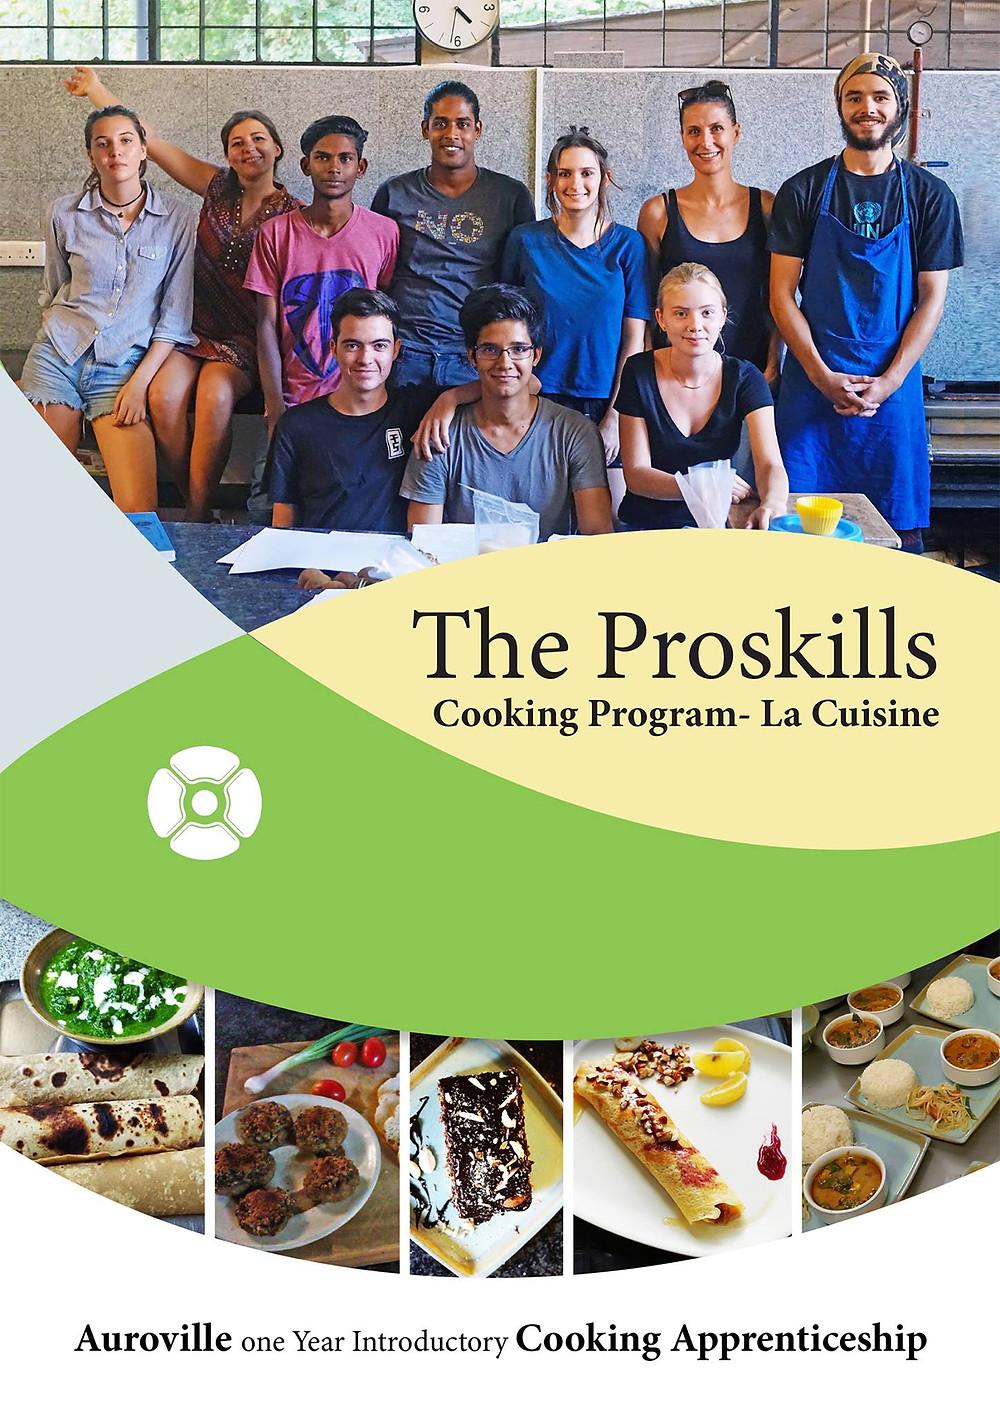 Proskills poster 1